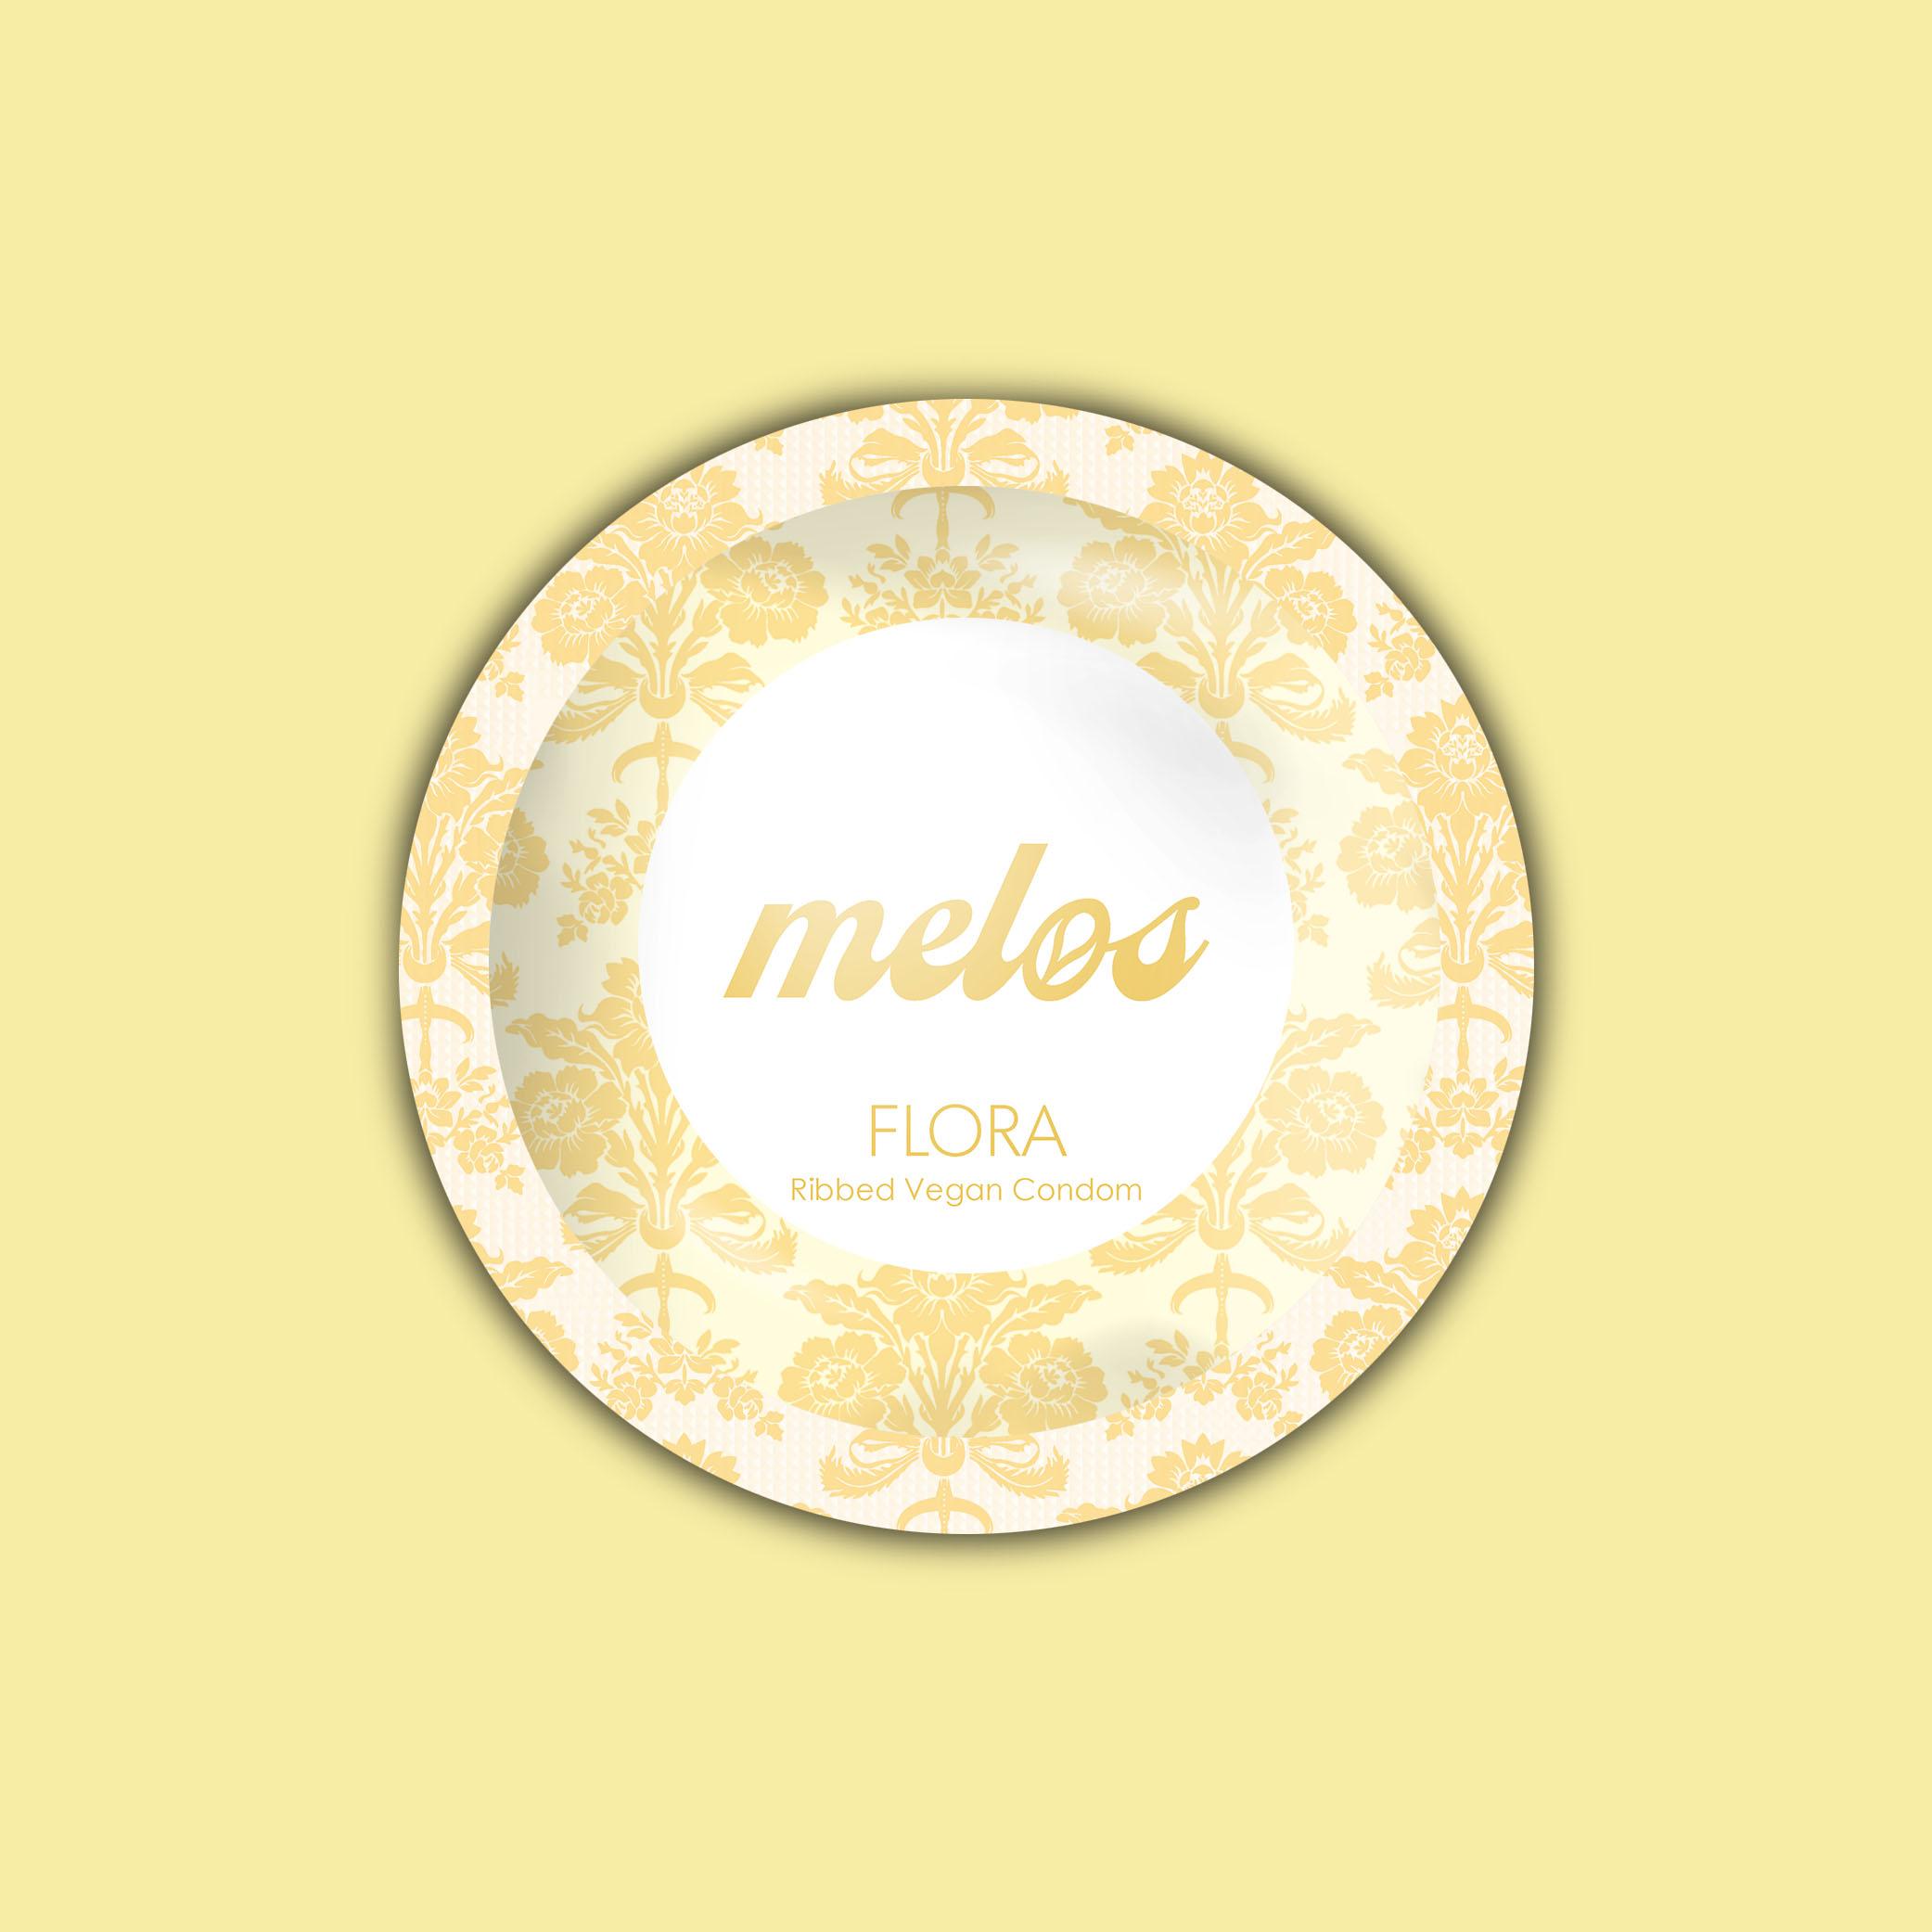 Melos_FLORA_Pack Mockup.jpg